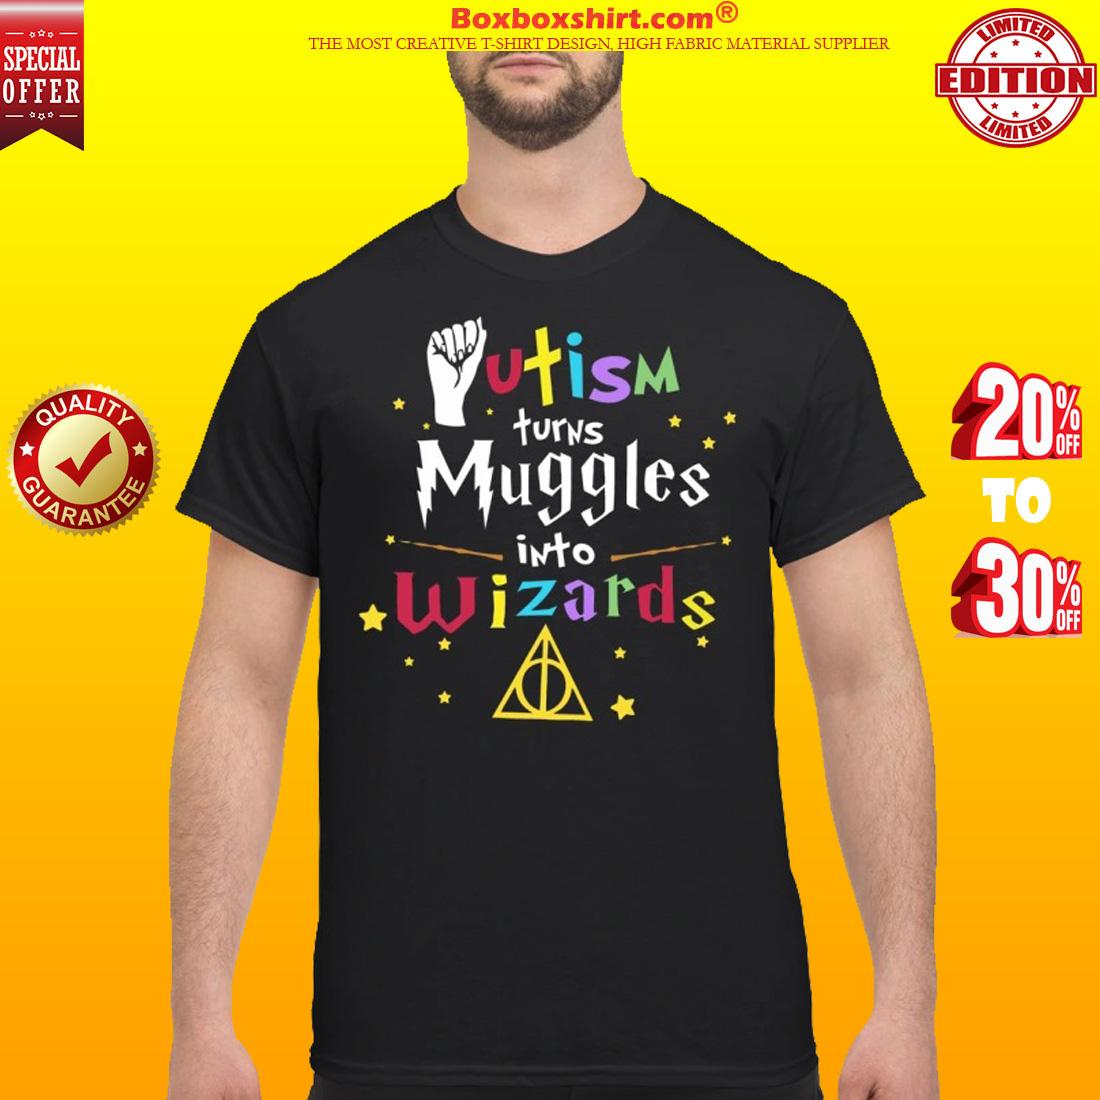 Autism turns muggles into wizards shirt